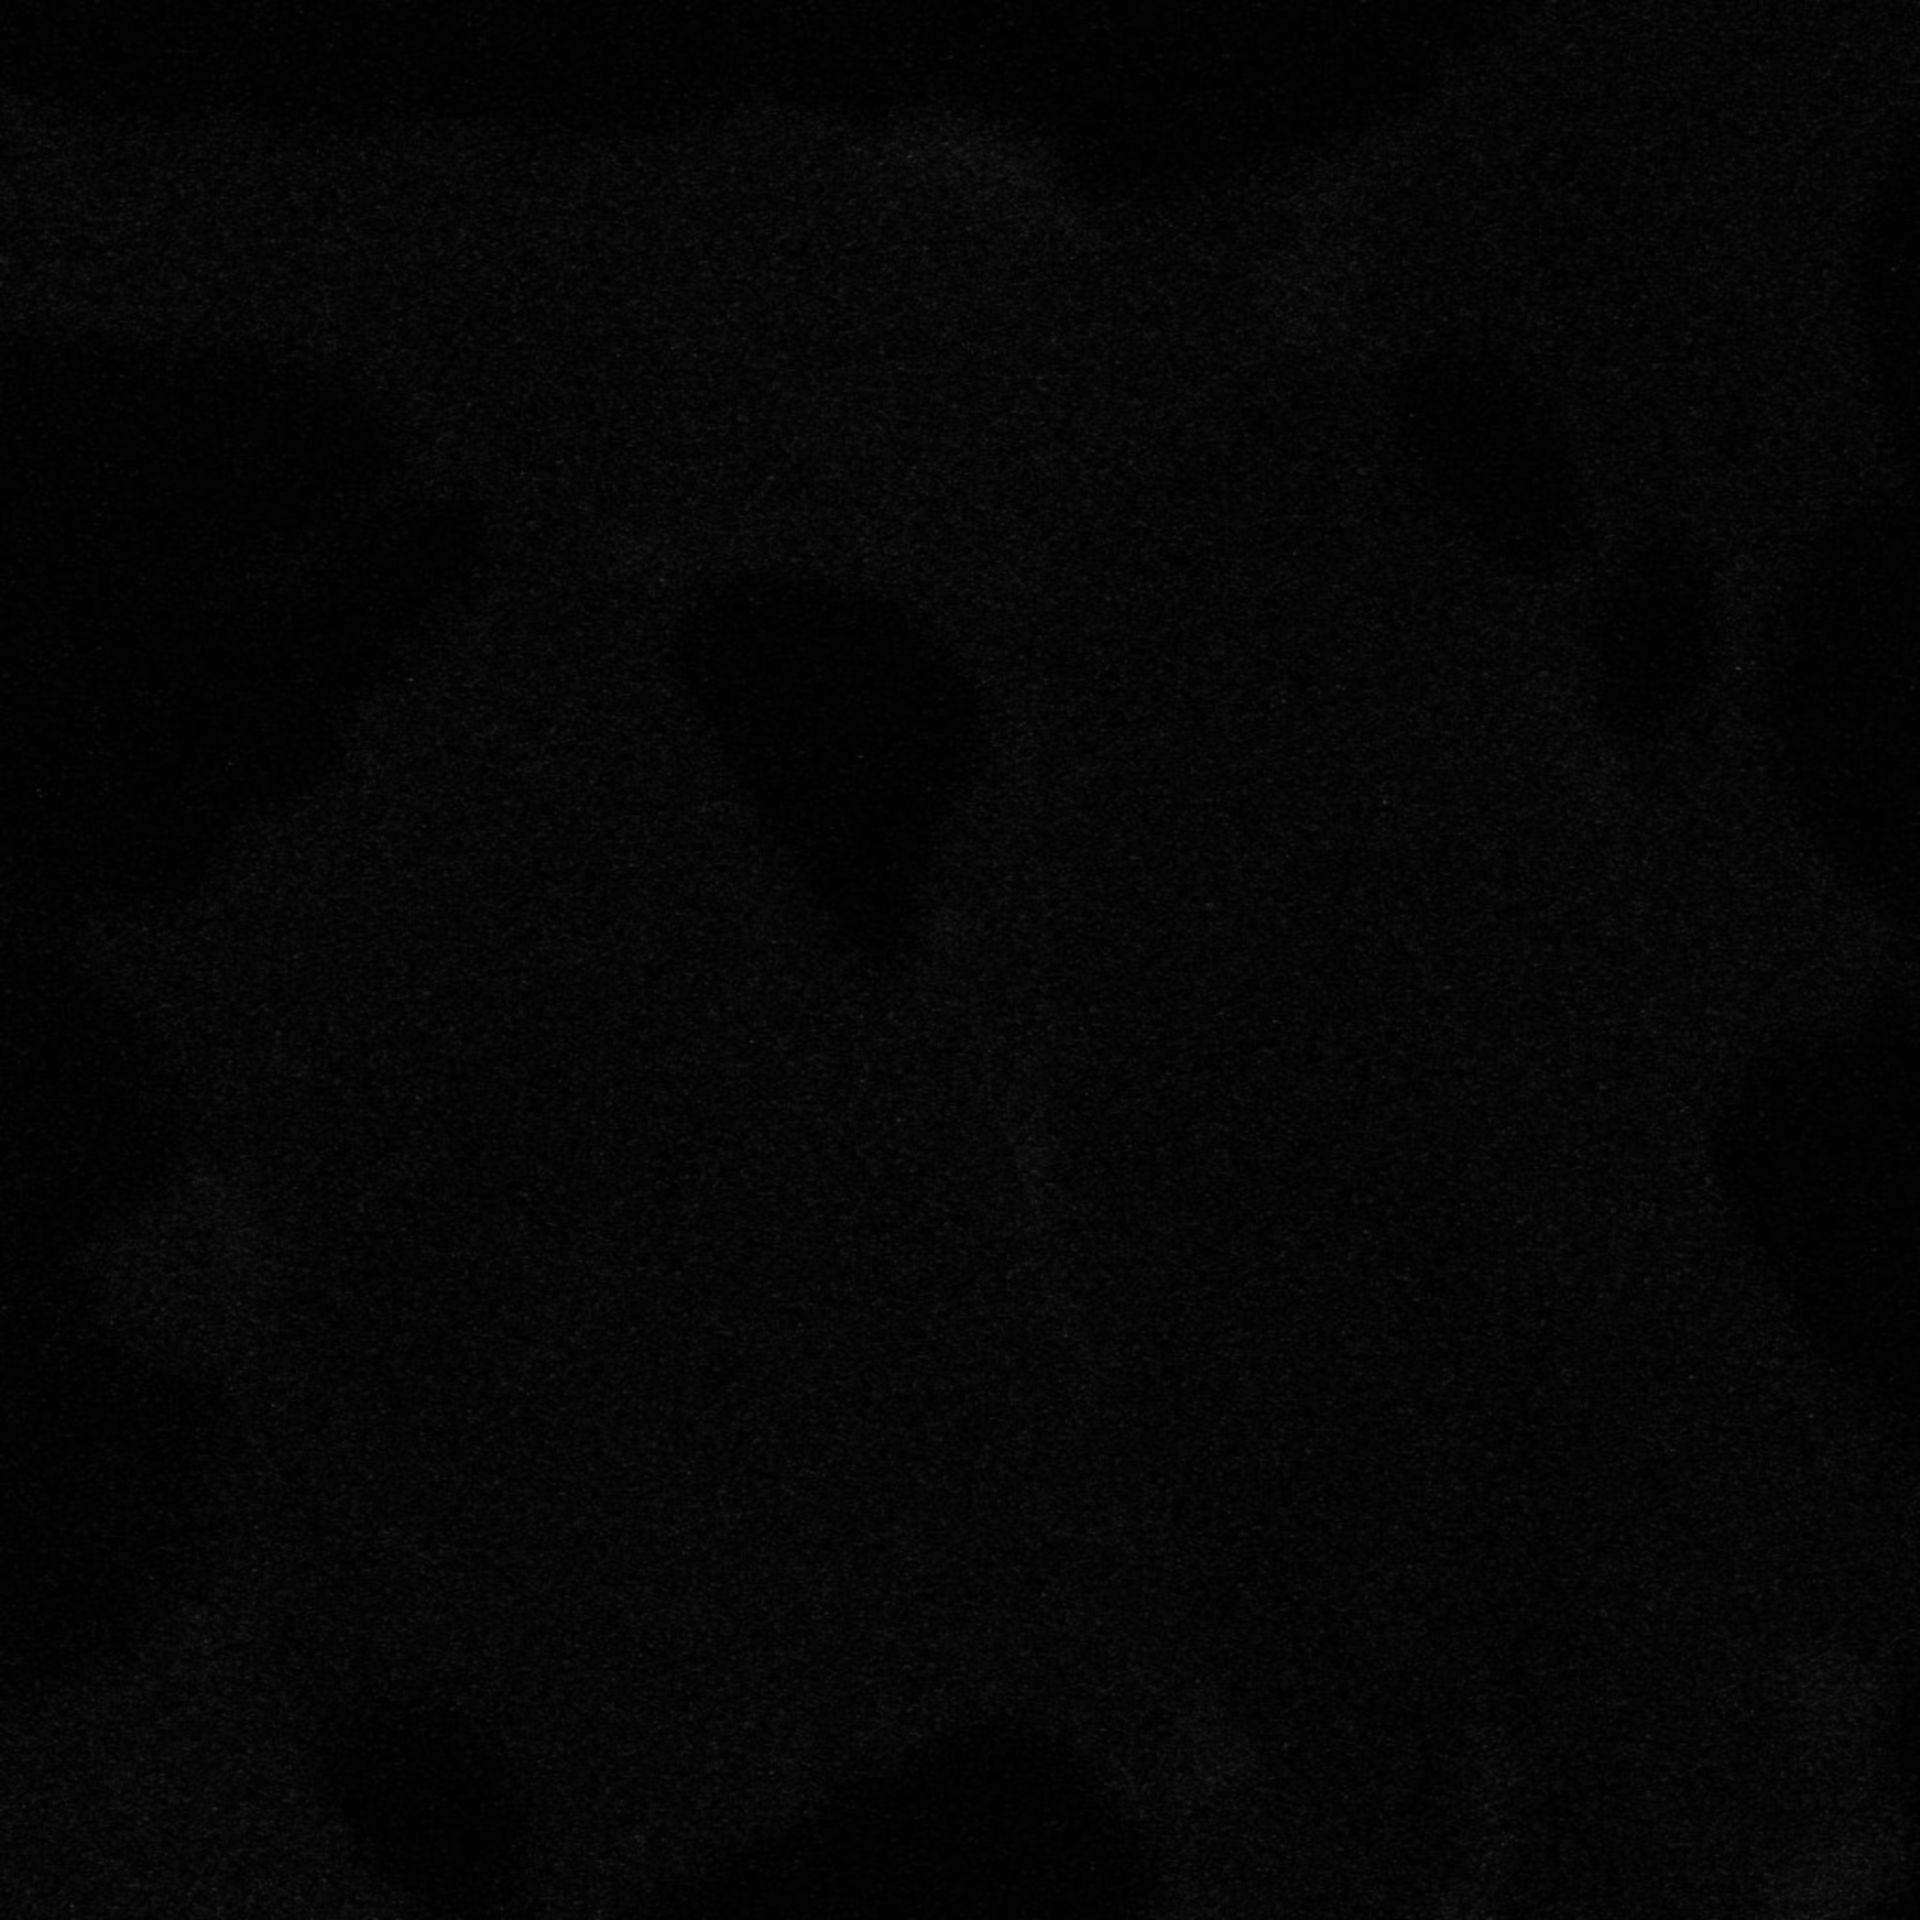 Chlorocebus sabaeus (Plasma membrane) - CIL:725